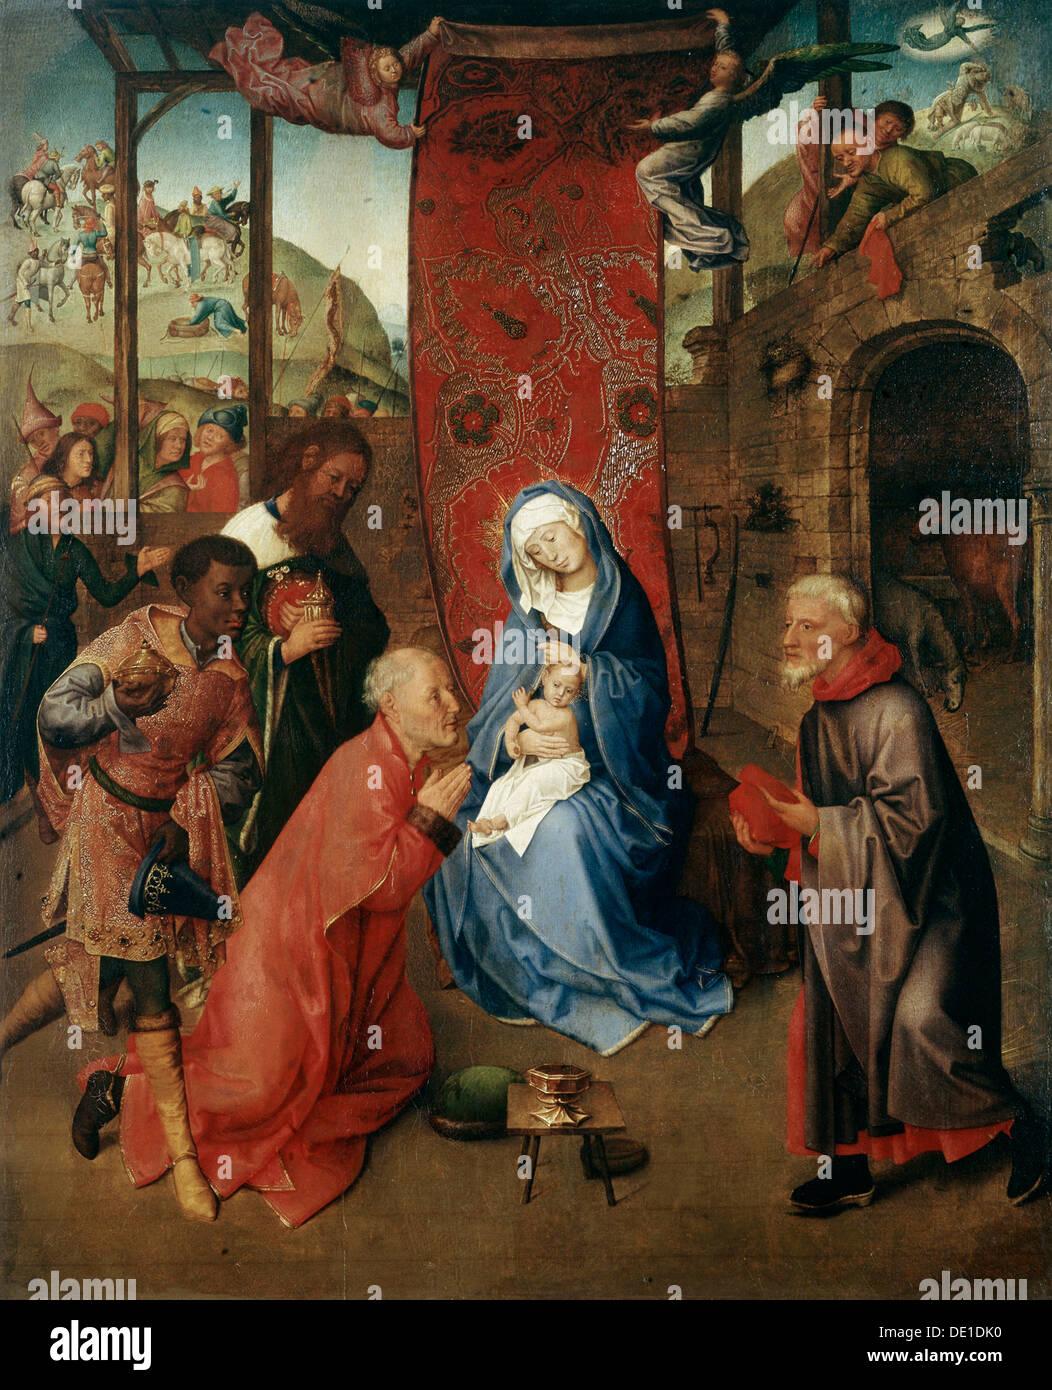 The Adoration Of The Magi 15th Century Artist Hugo